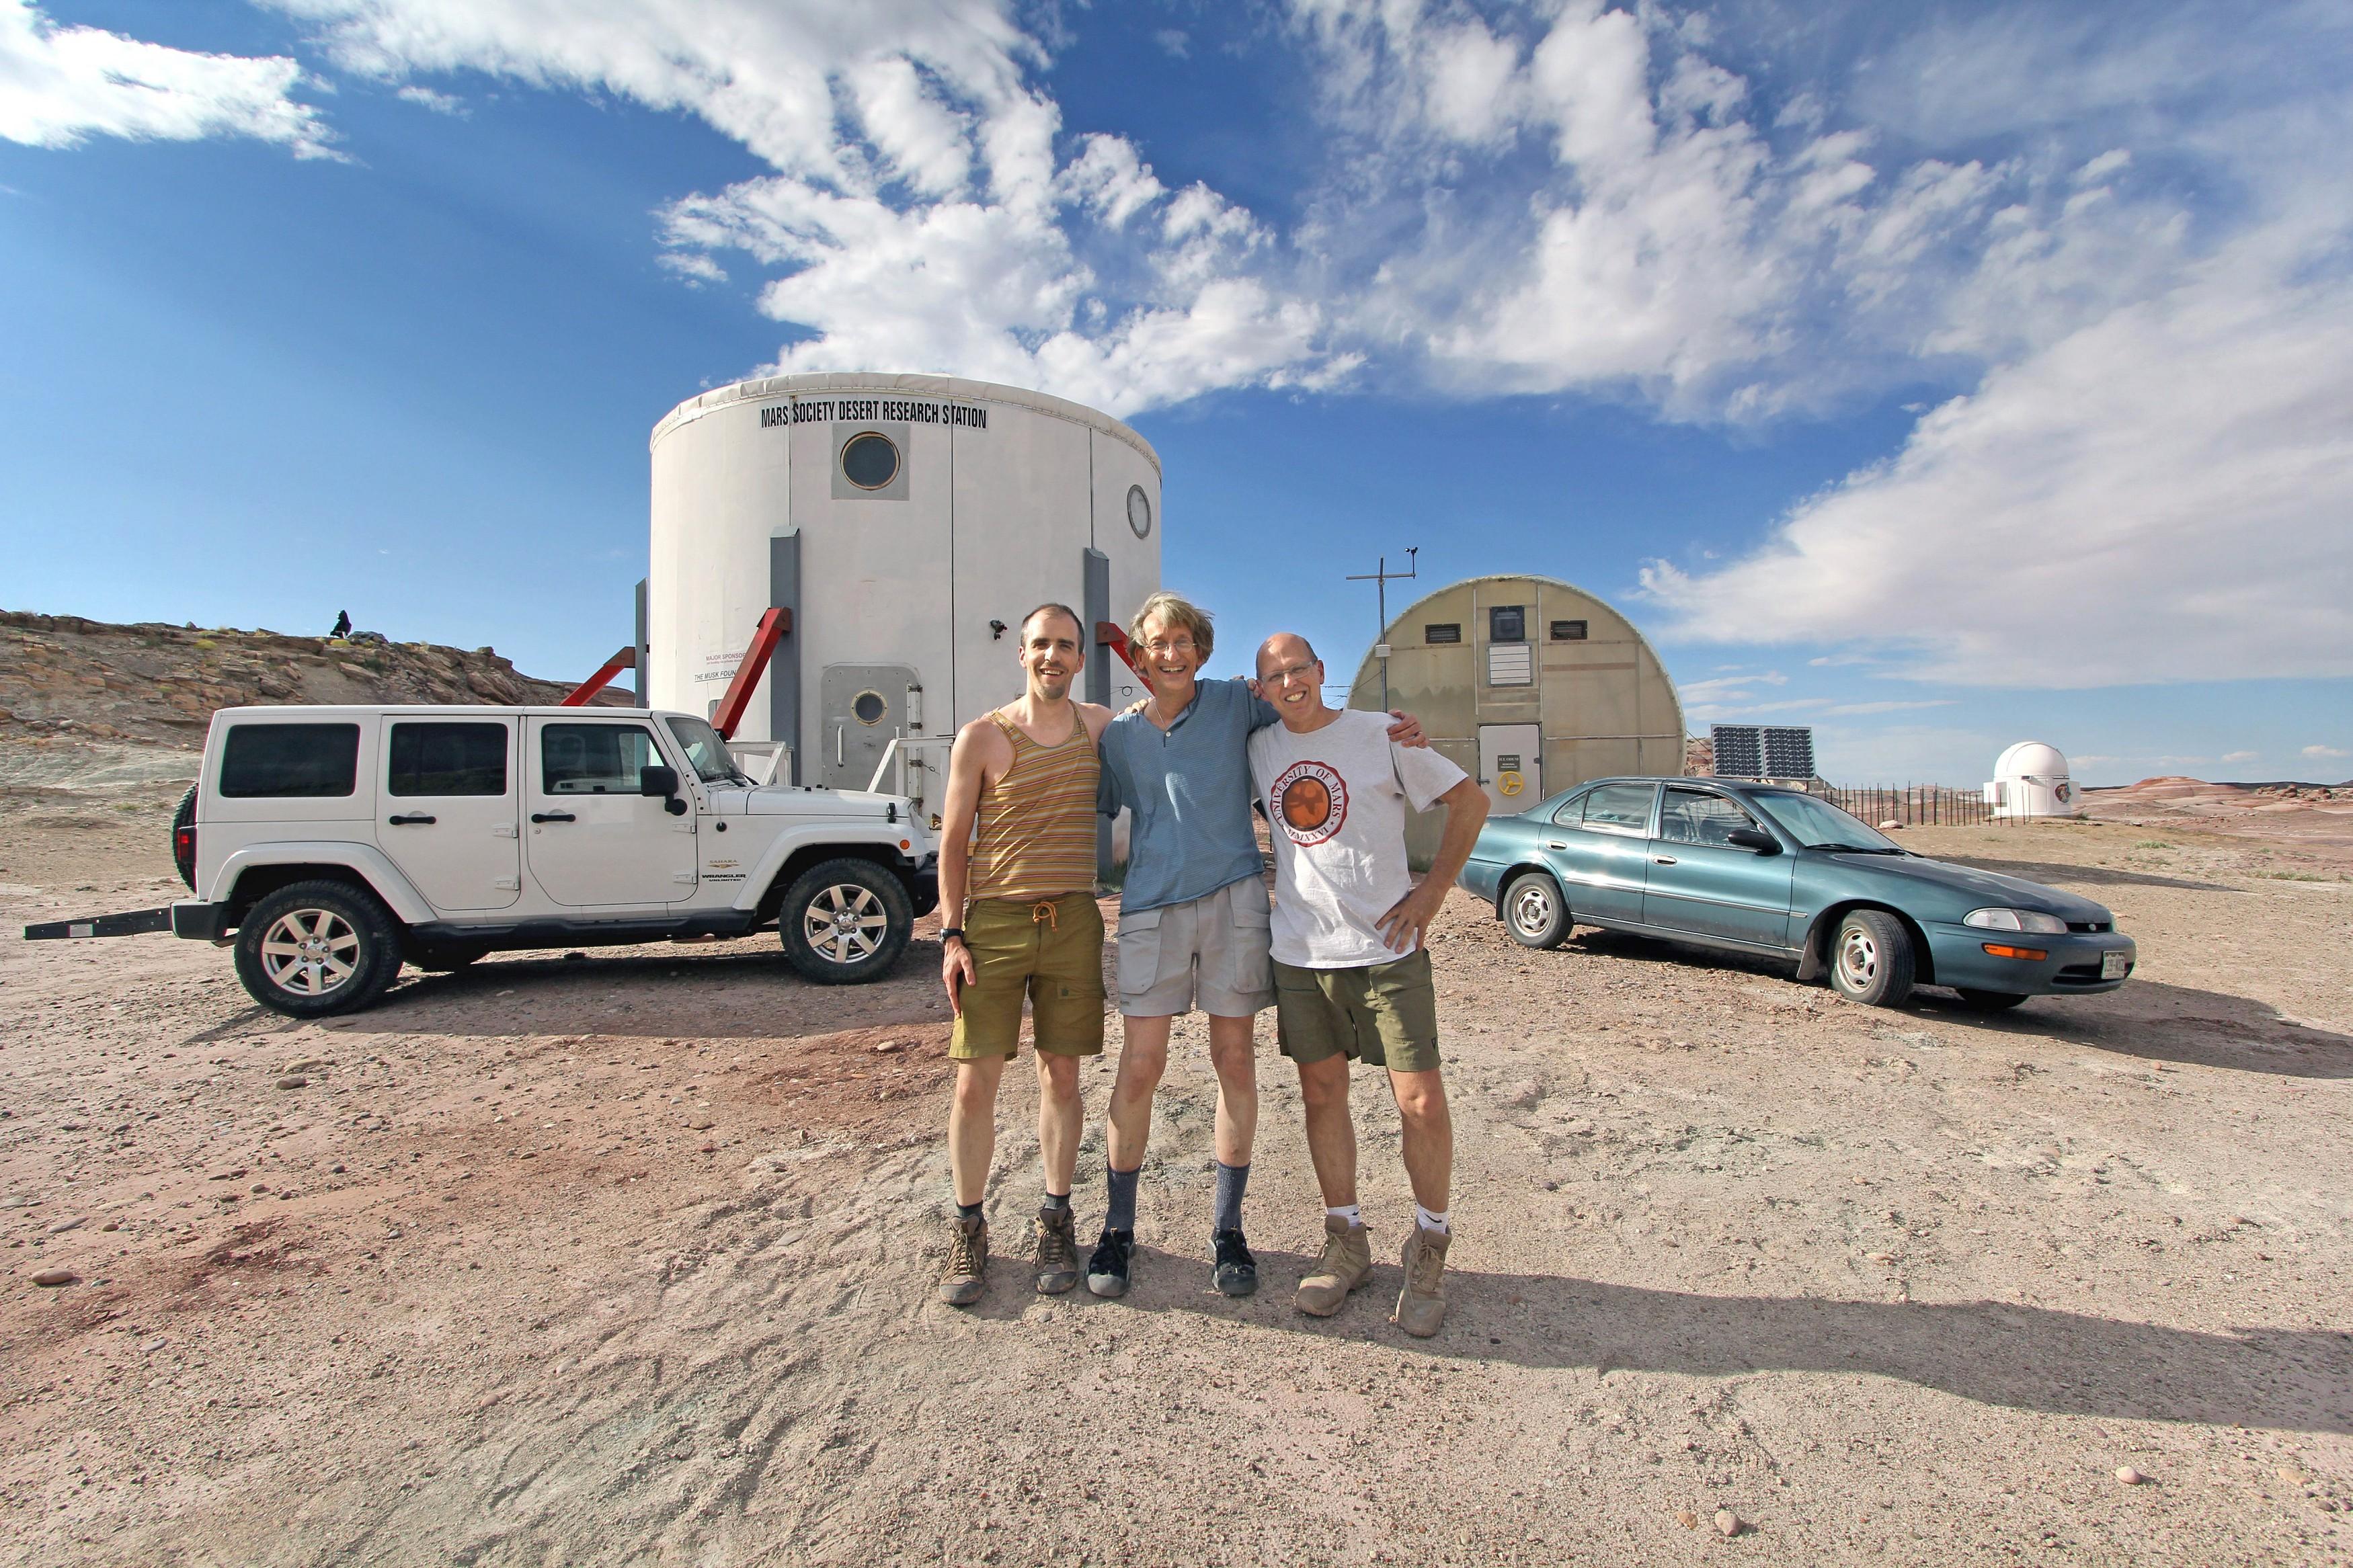 Adam Jones, Gary Becker and Peter Detterline at the Mars Desert Research Station.   Photo credit, Jones and Becker